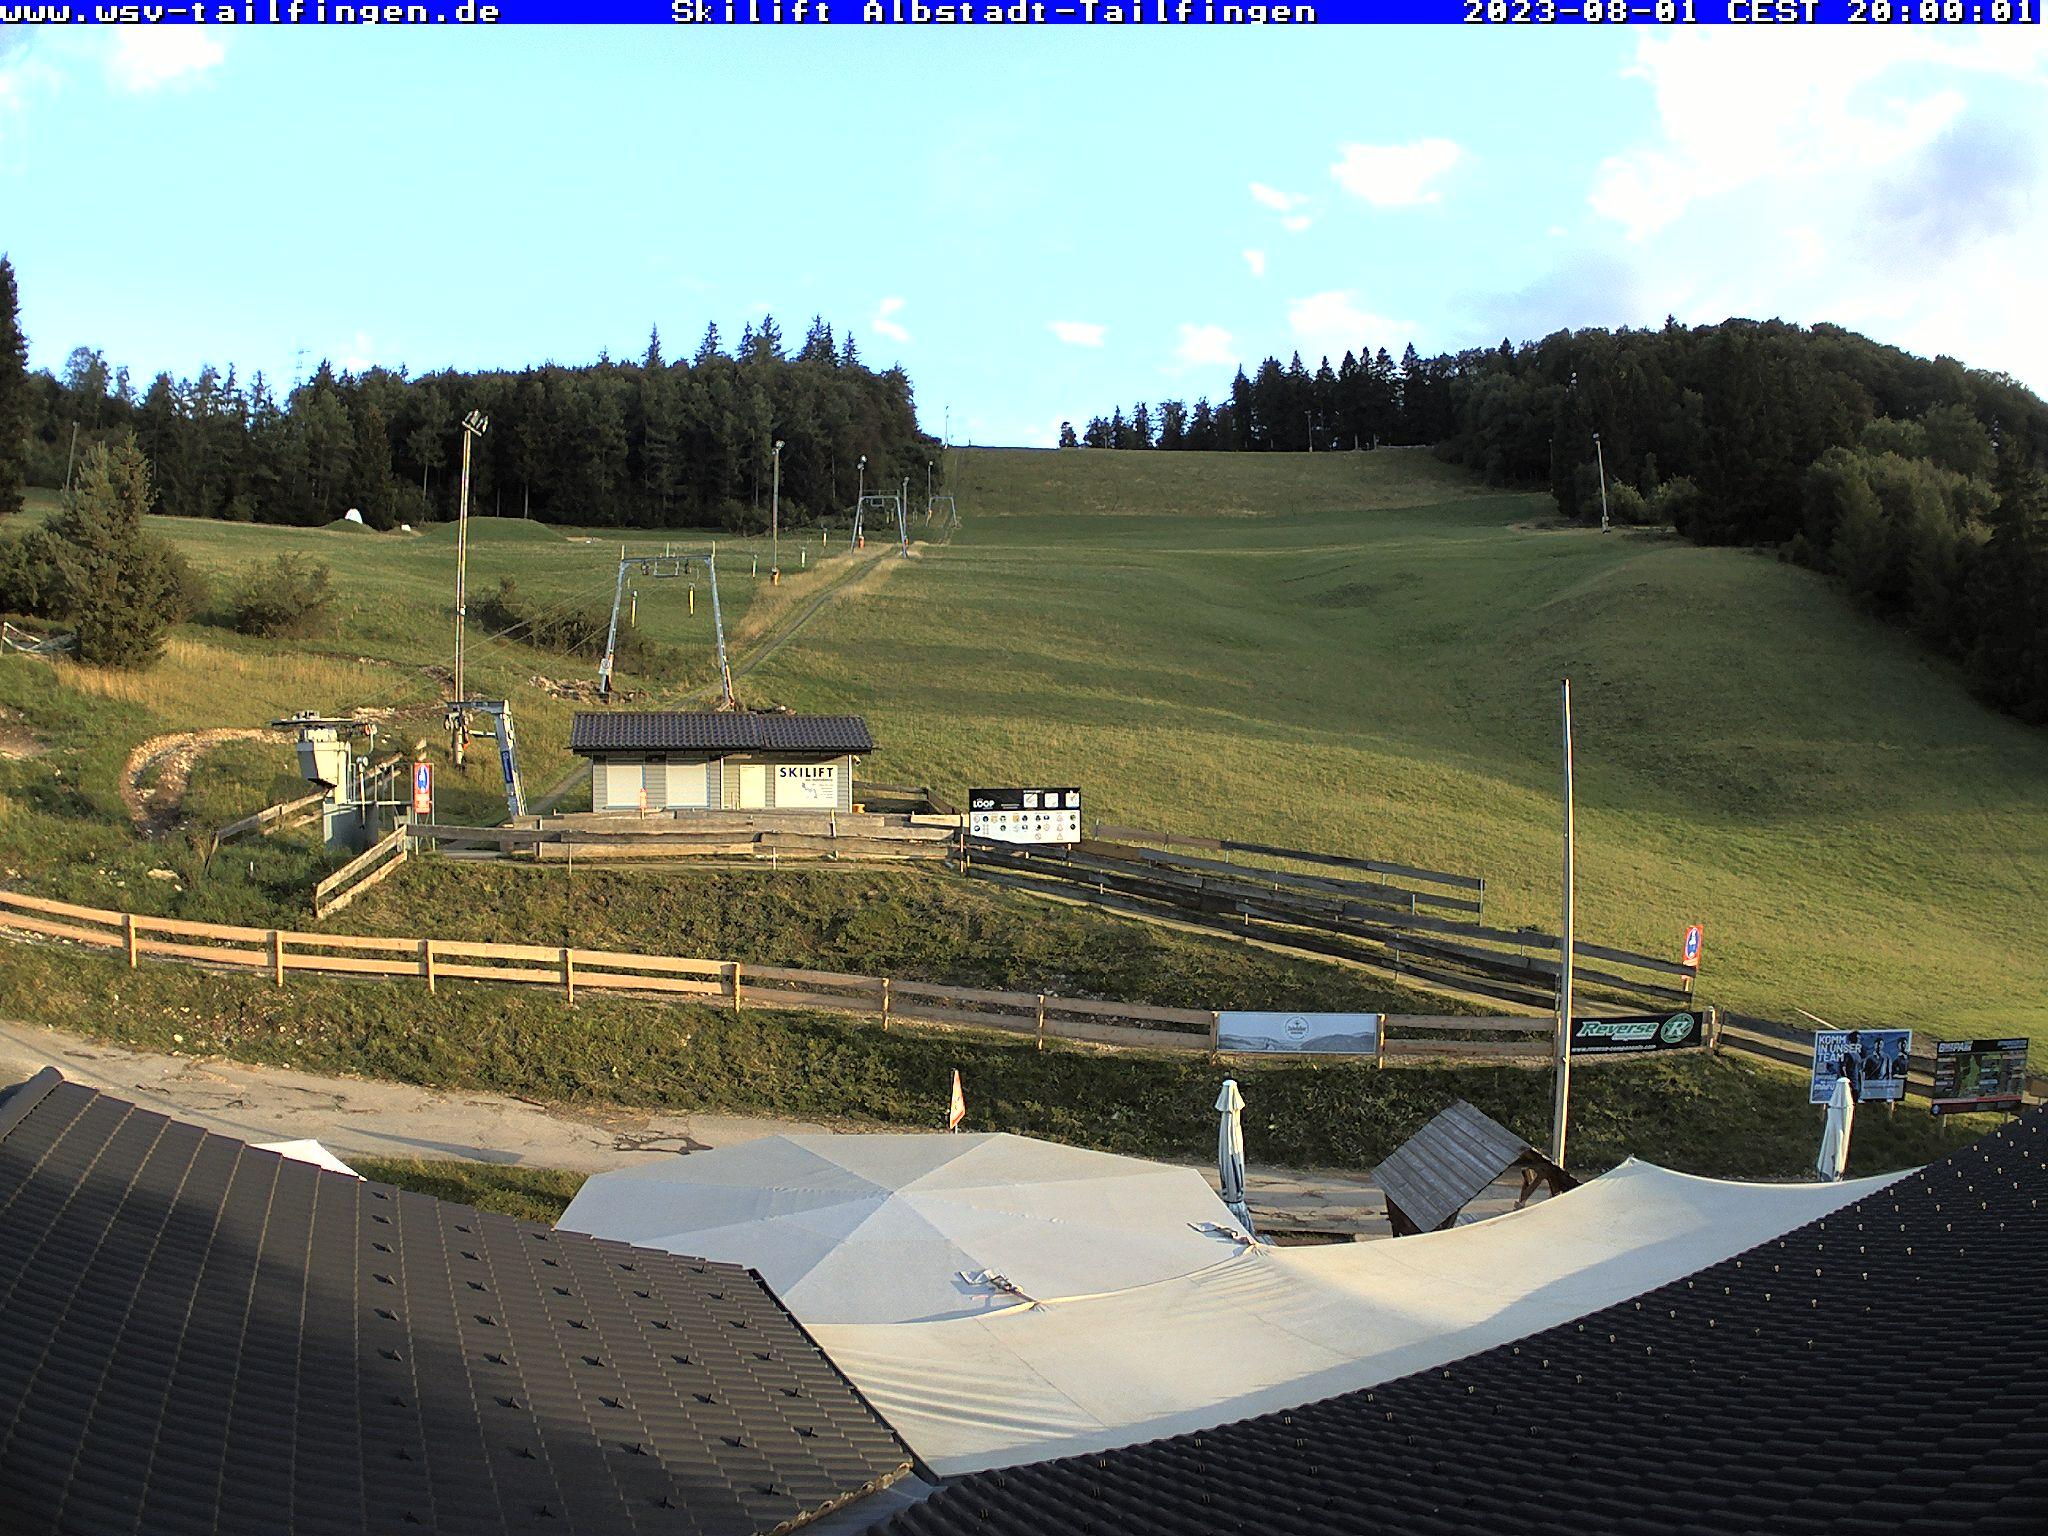 Webcam-Foto 20:00 Uhr / Skilift Albstadt-Tailfingen